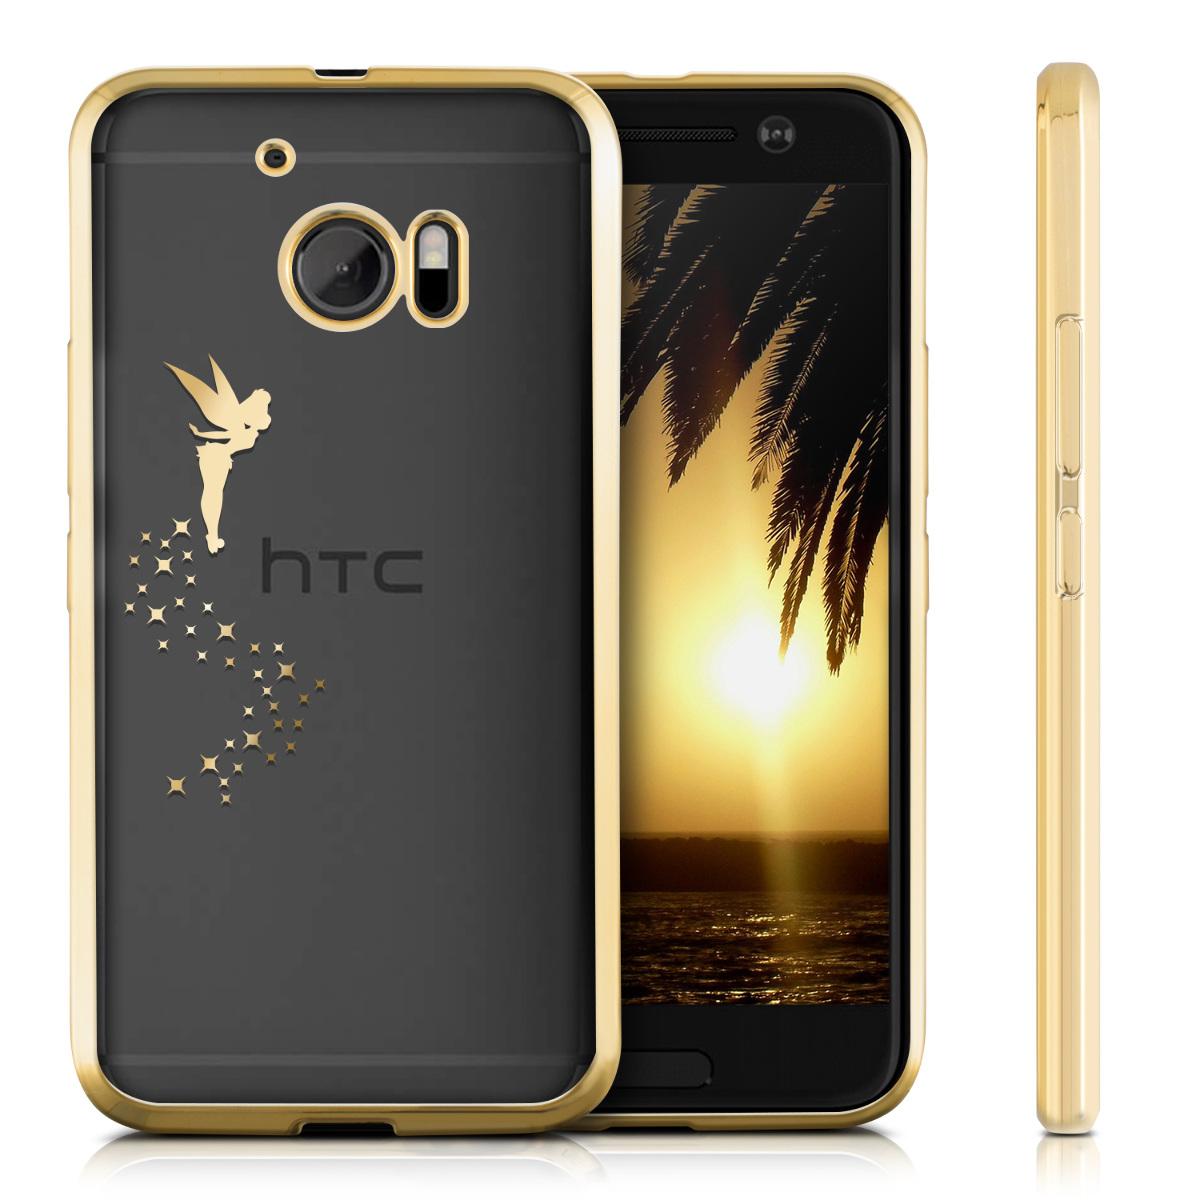 kwmobile-FUNDA-PARA-HTC-10-TPU-SILICONA-CARCASA-PROTECTORA-ESTUCHE-MoVIL-BOLSA